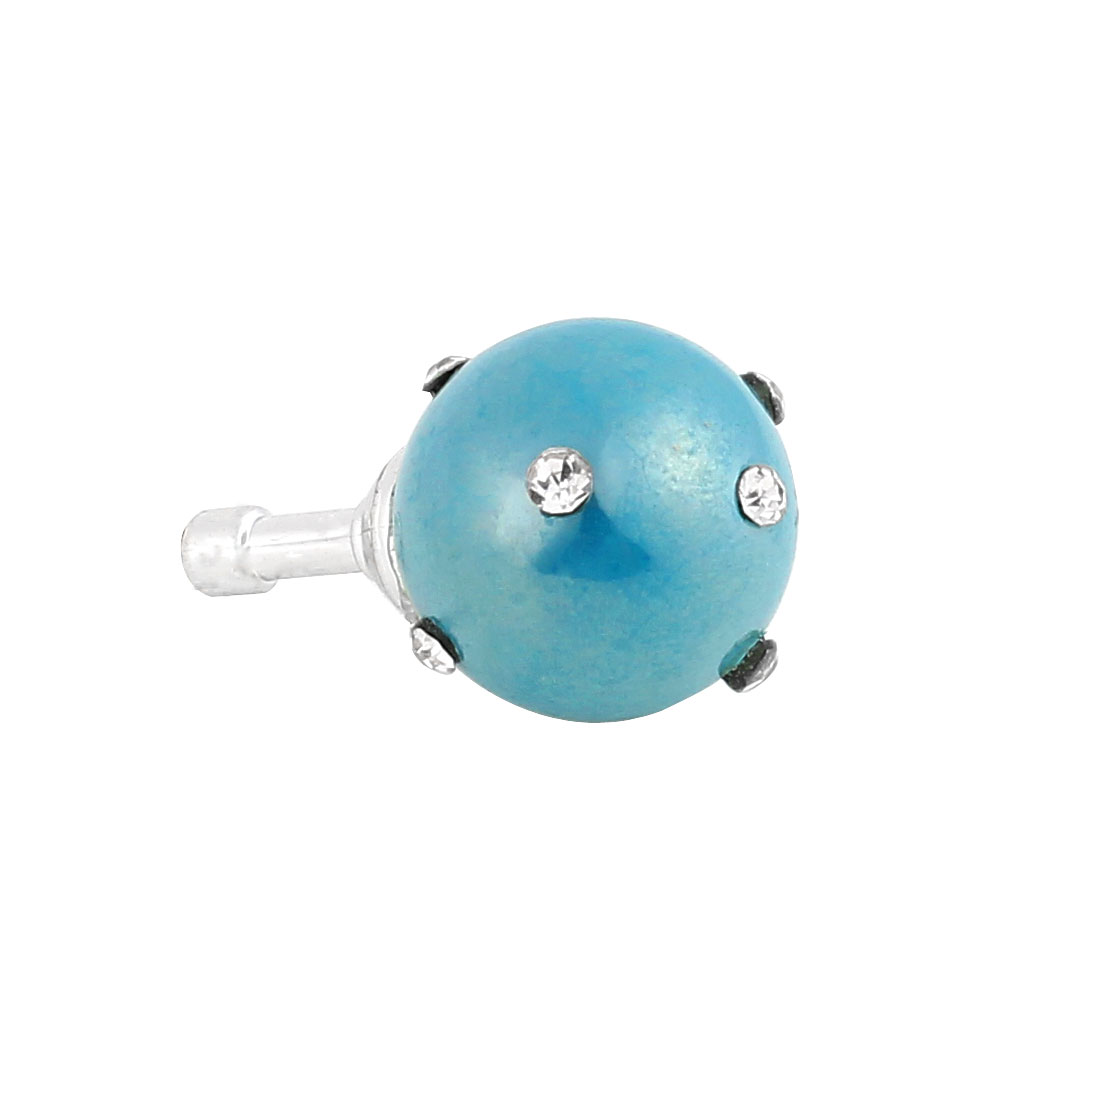 Teal Faux Pearl Rhinestone 3.5mm Earphone Anti Dust Plug Cap Stopper for Phone